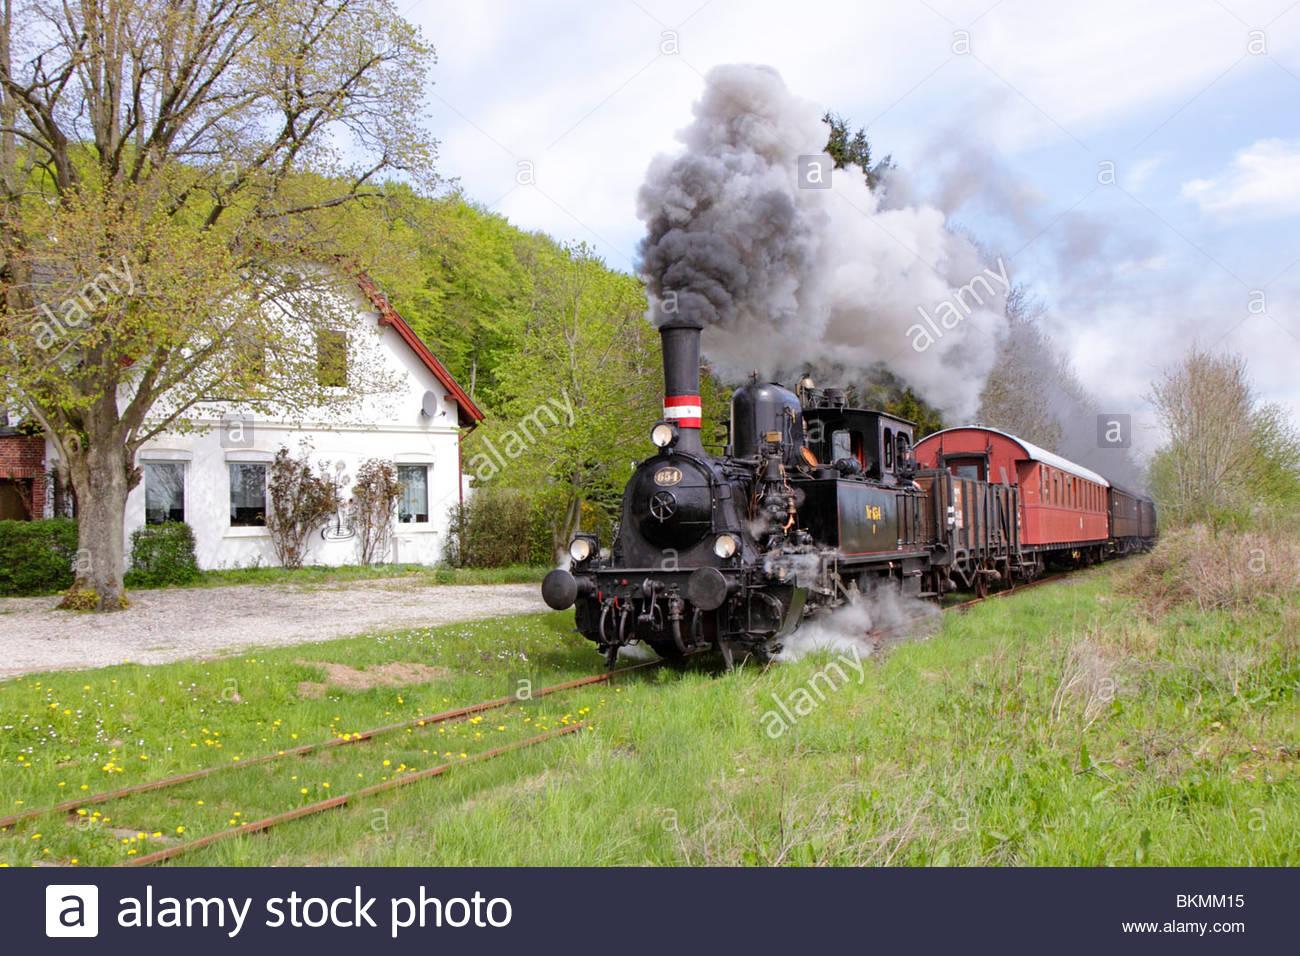 Dampfeisenbahn Stock Photos & Dampfeisenbahn Stock Images.